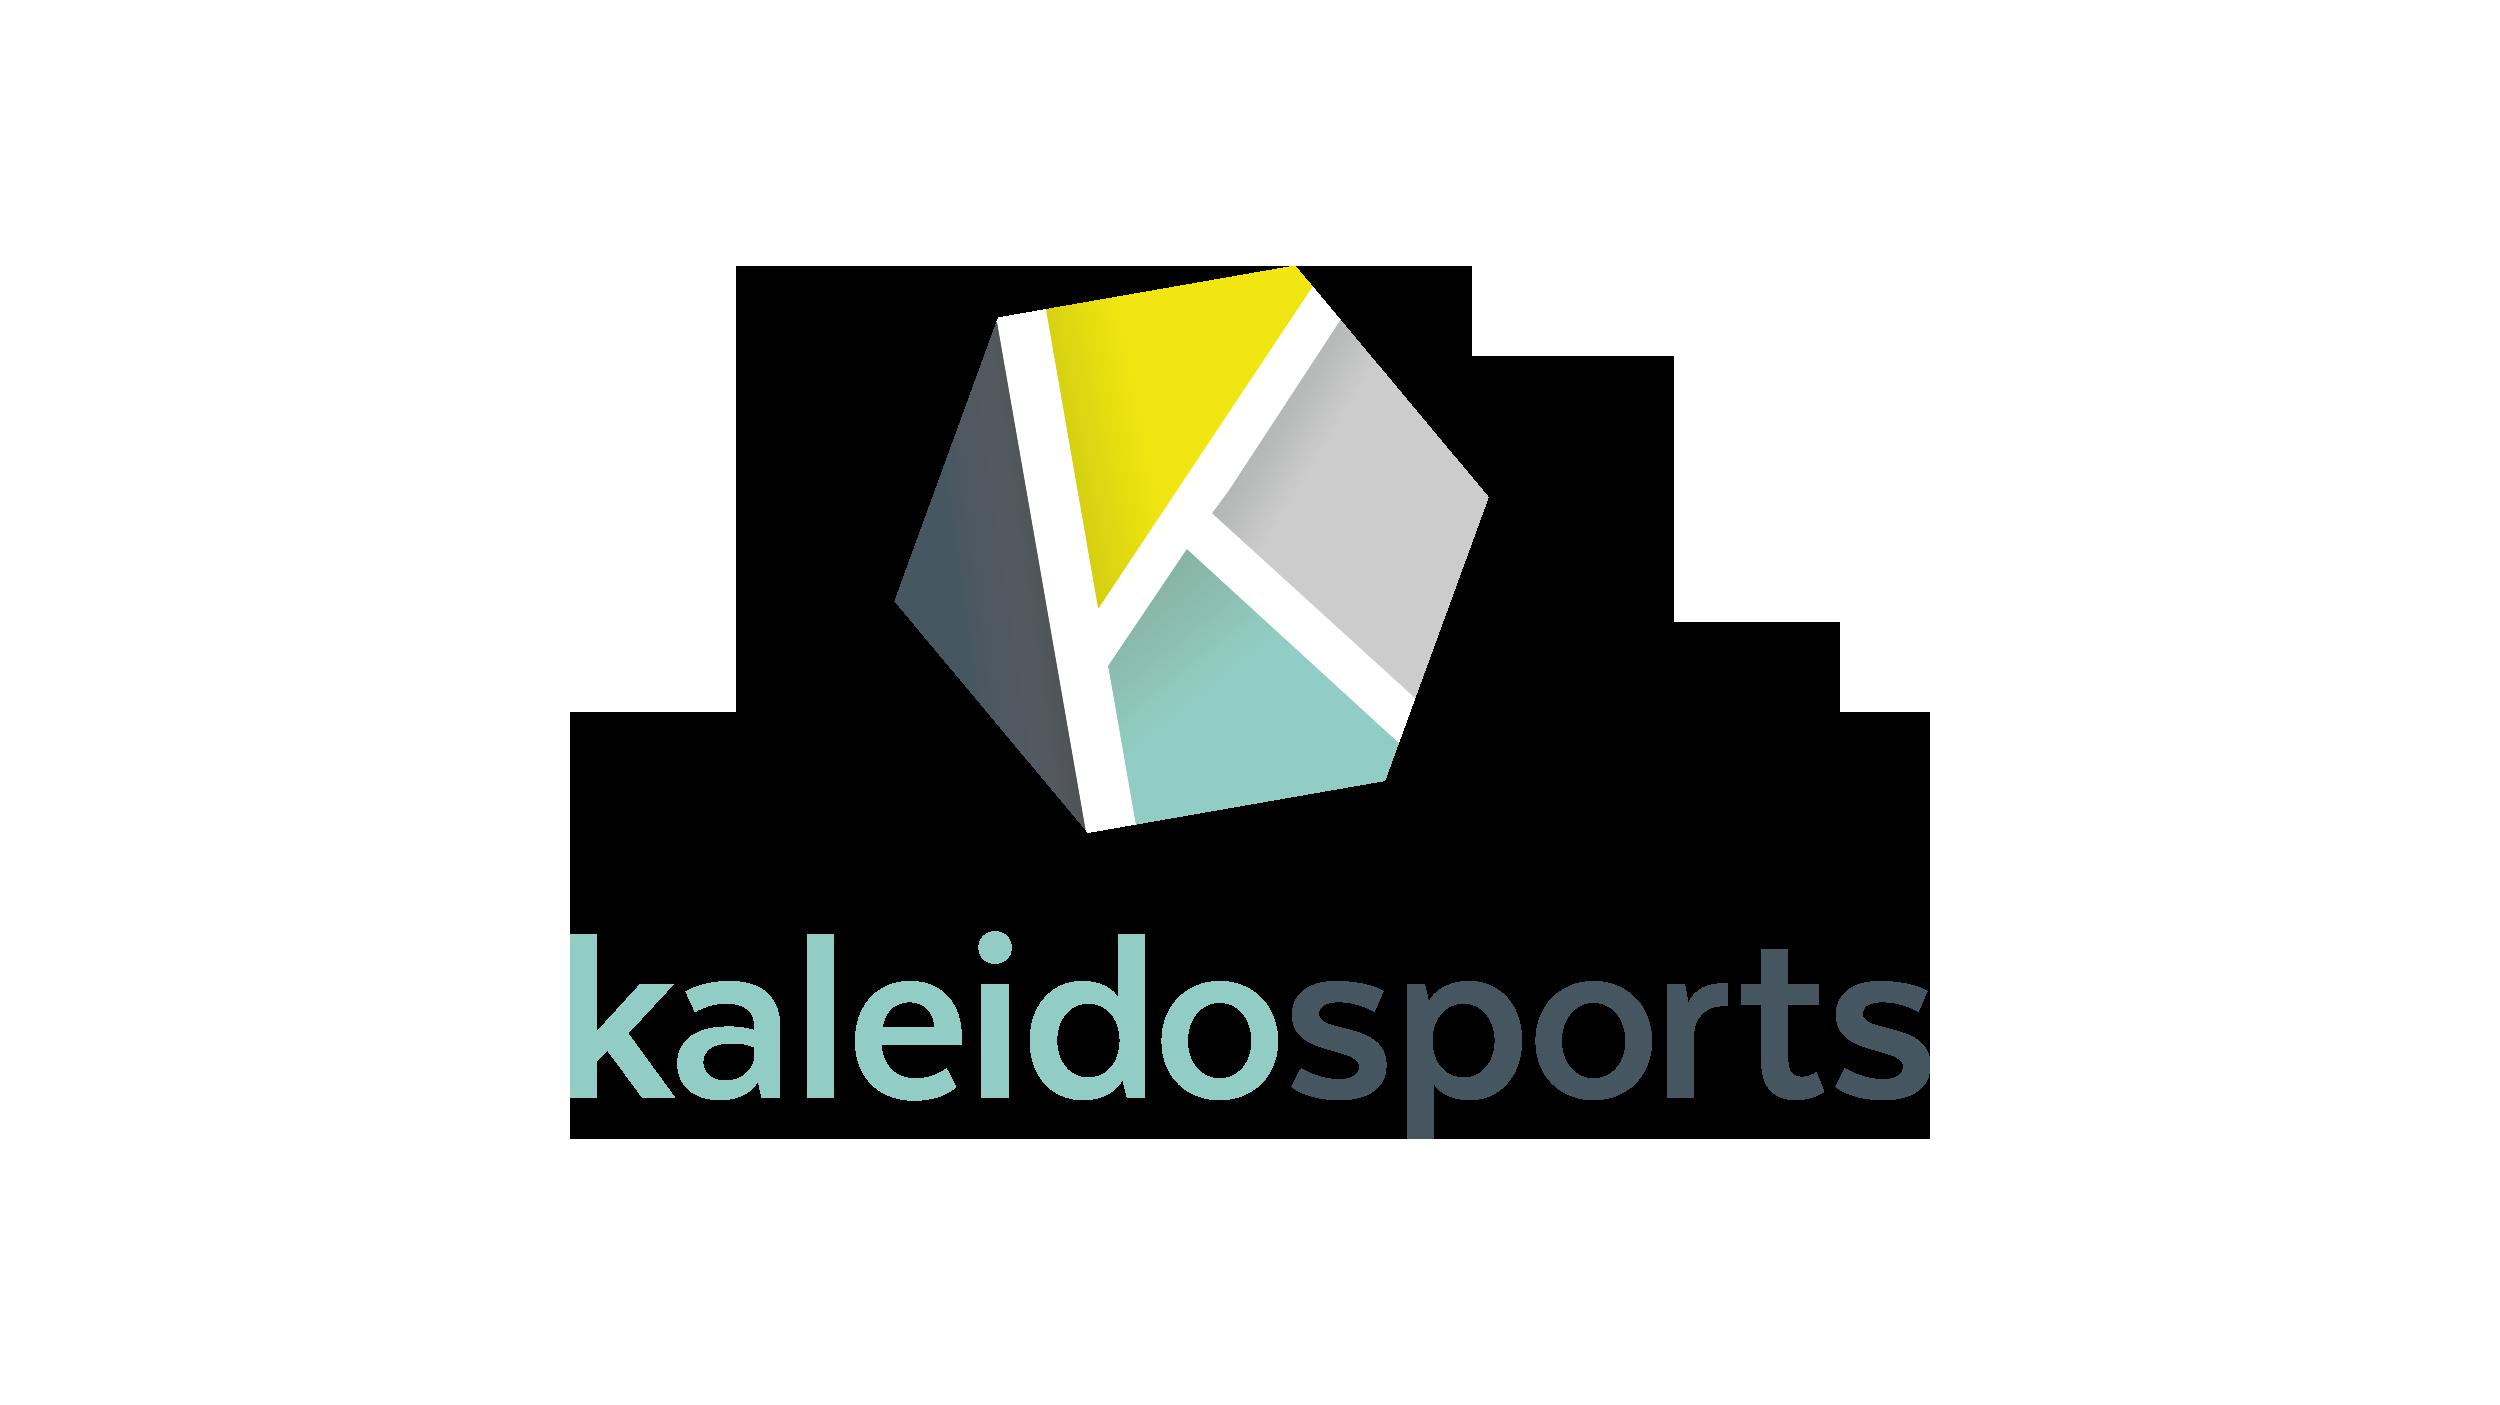 katelynbishop_design_kaleidosports_logo1